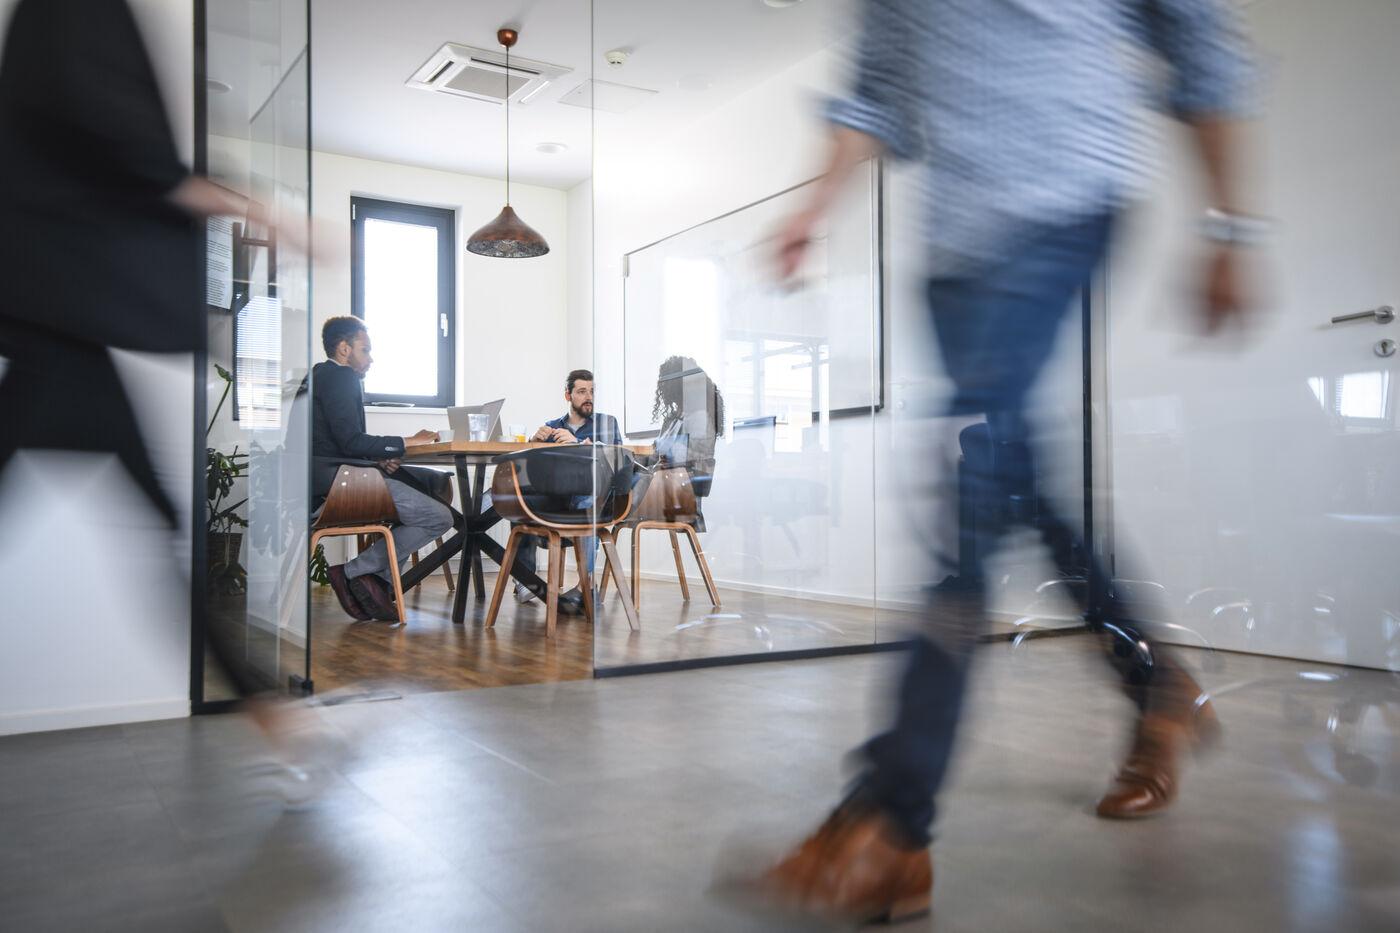 IT-Projektleiter Kunden-Portal (m/w/d) - Job Heidelberg, Home office - Jobs bei Discovergy - Application form